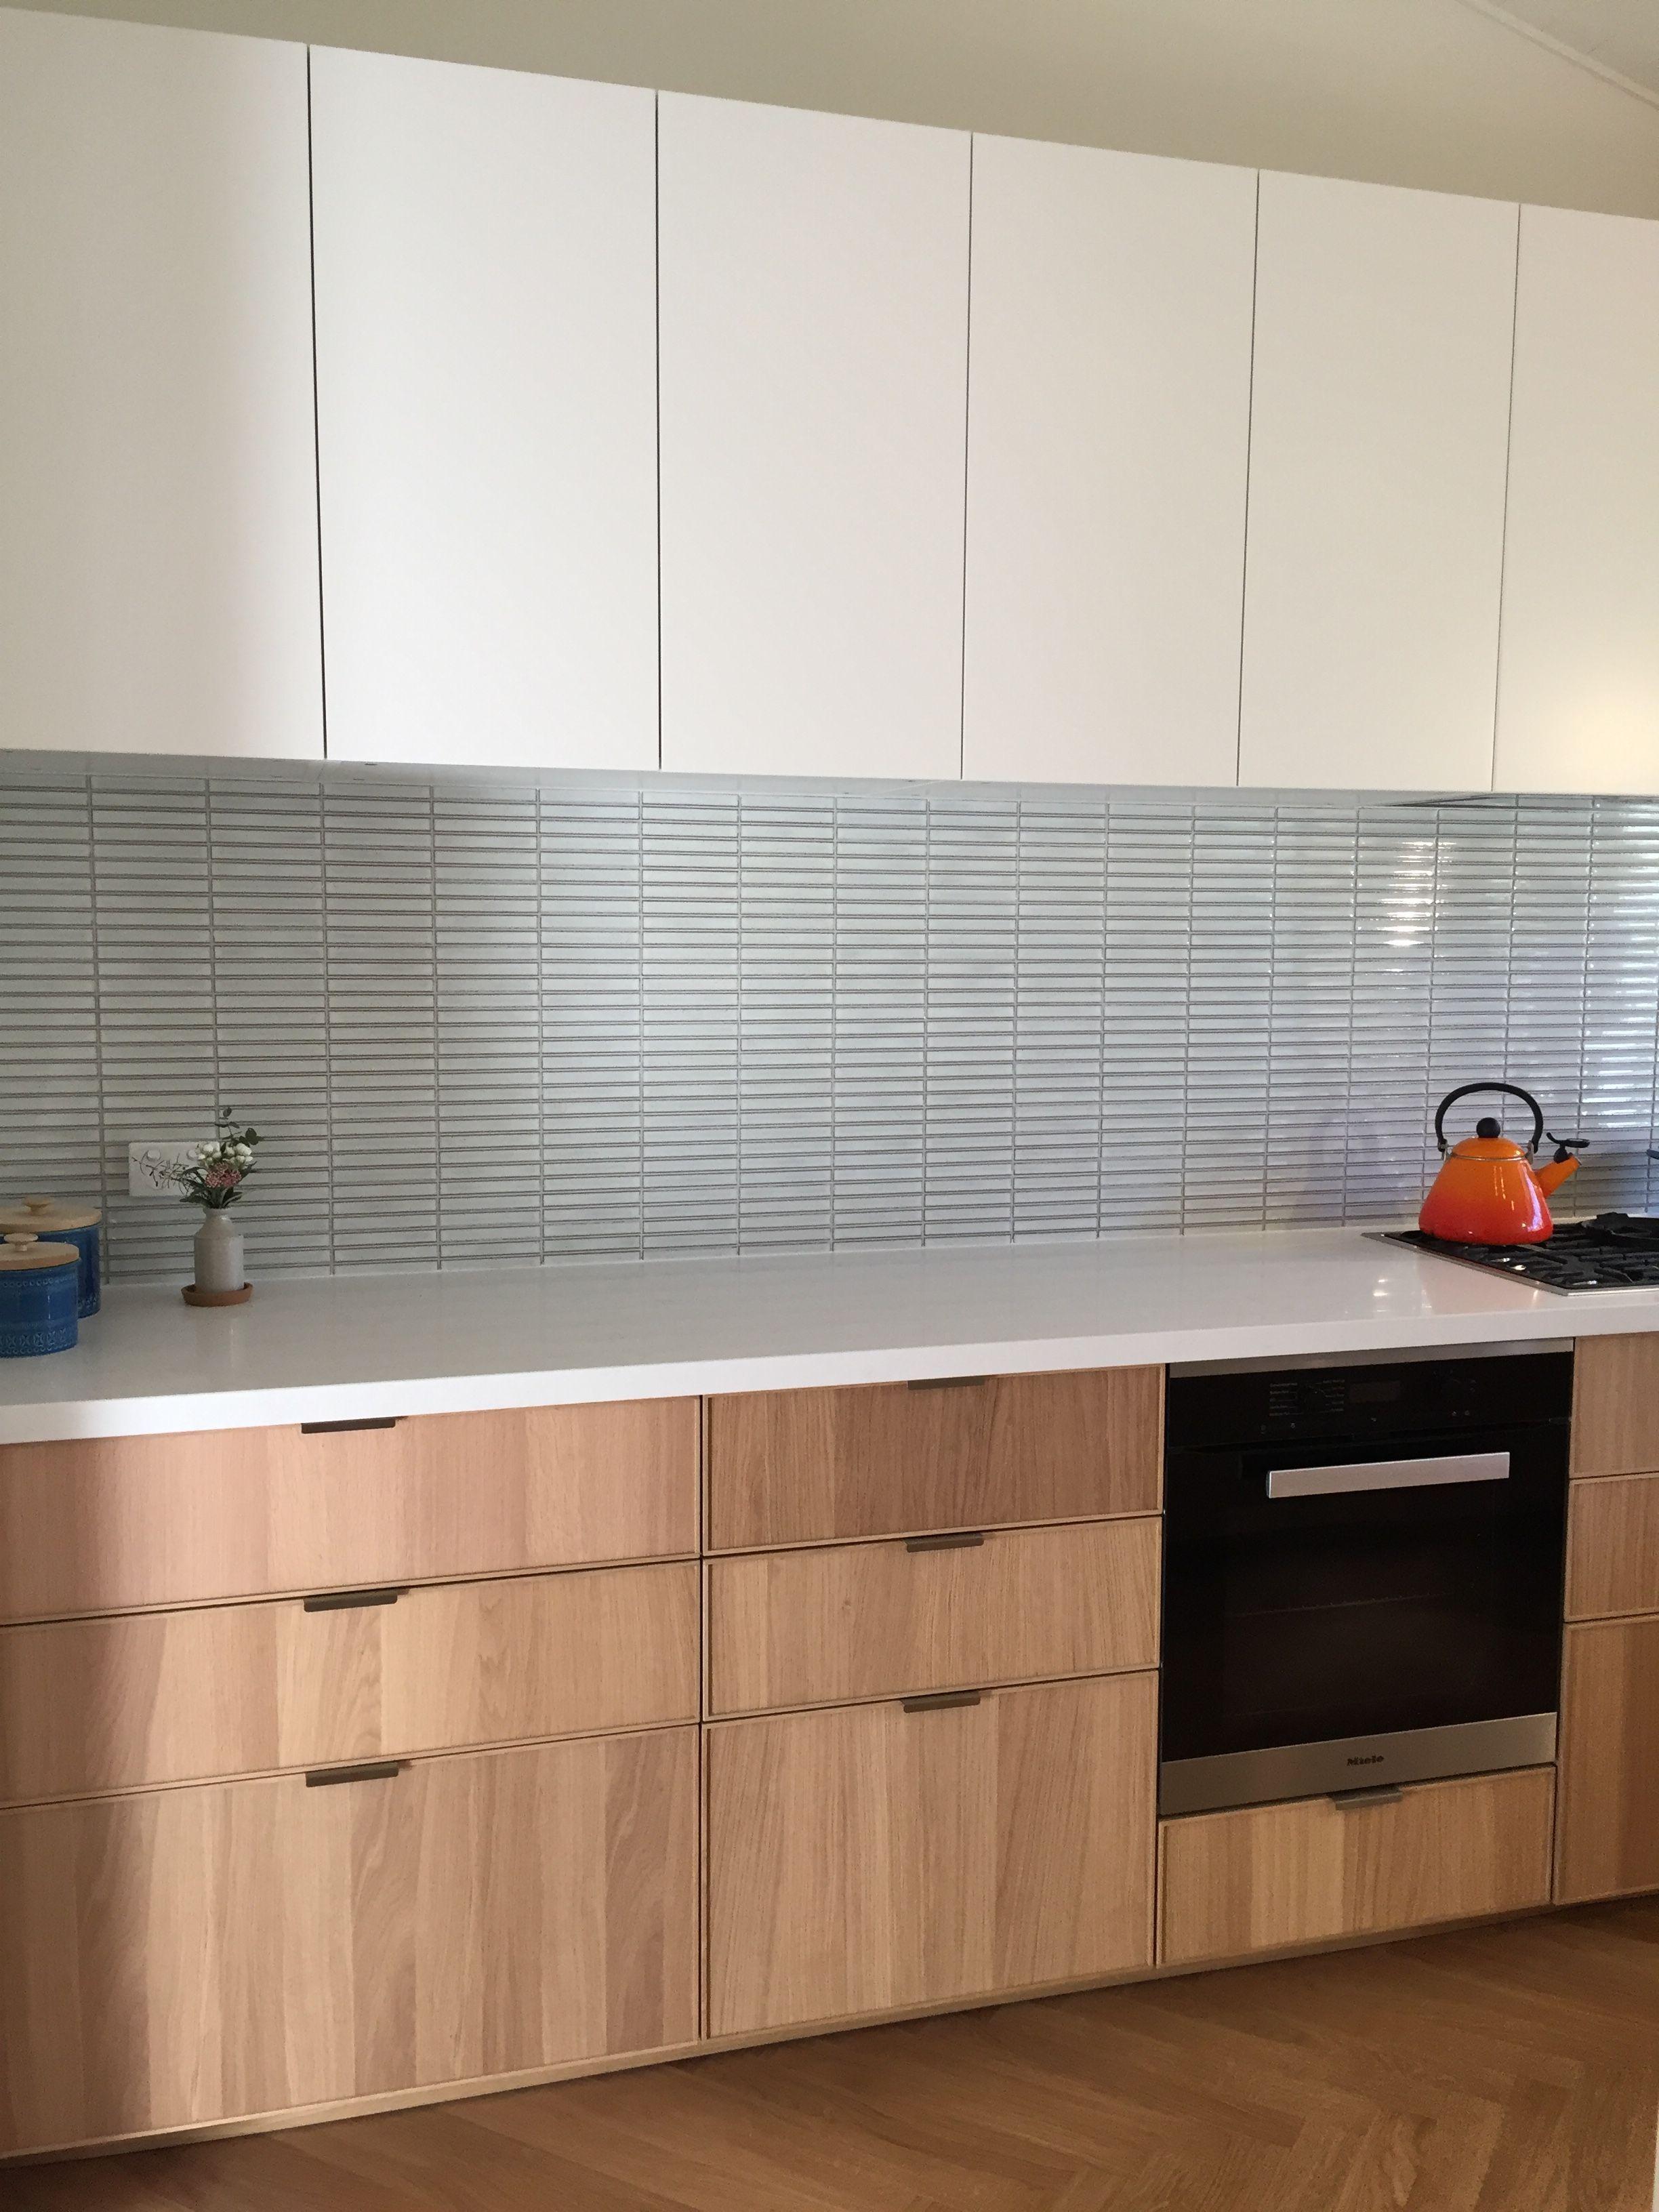 Best Ikea Ekestad And Metod Kitchen With Artedomus Inax Yuki 640 x 480